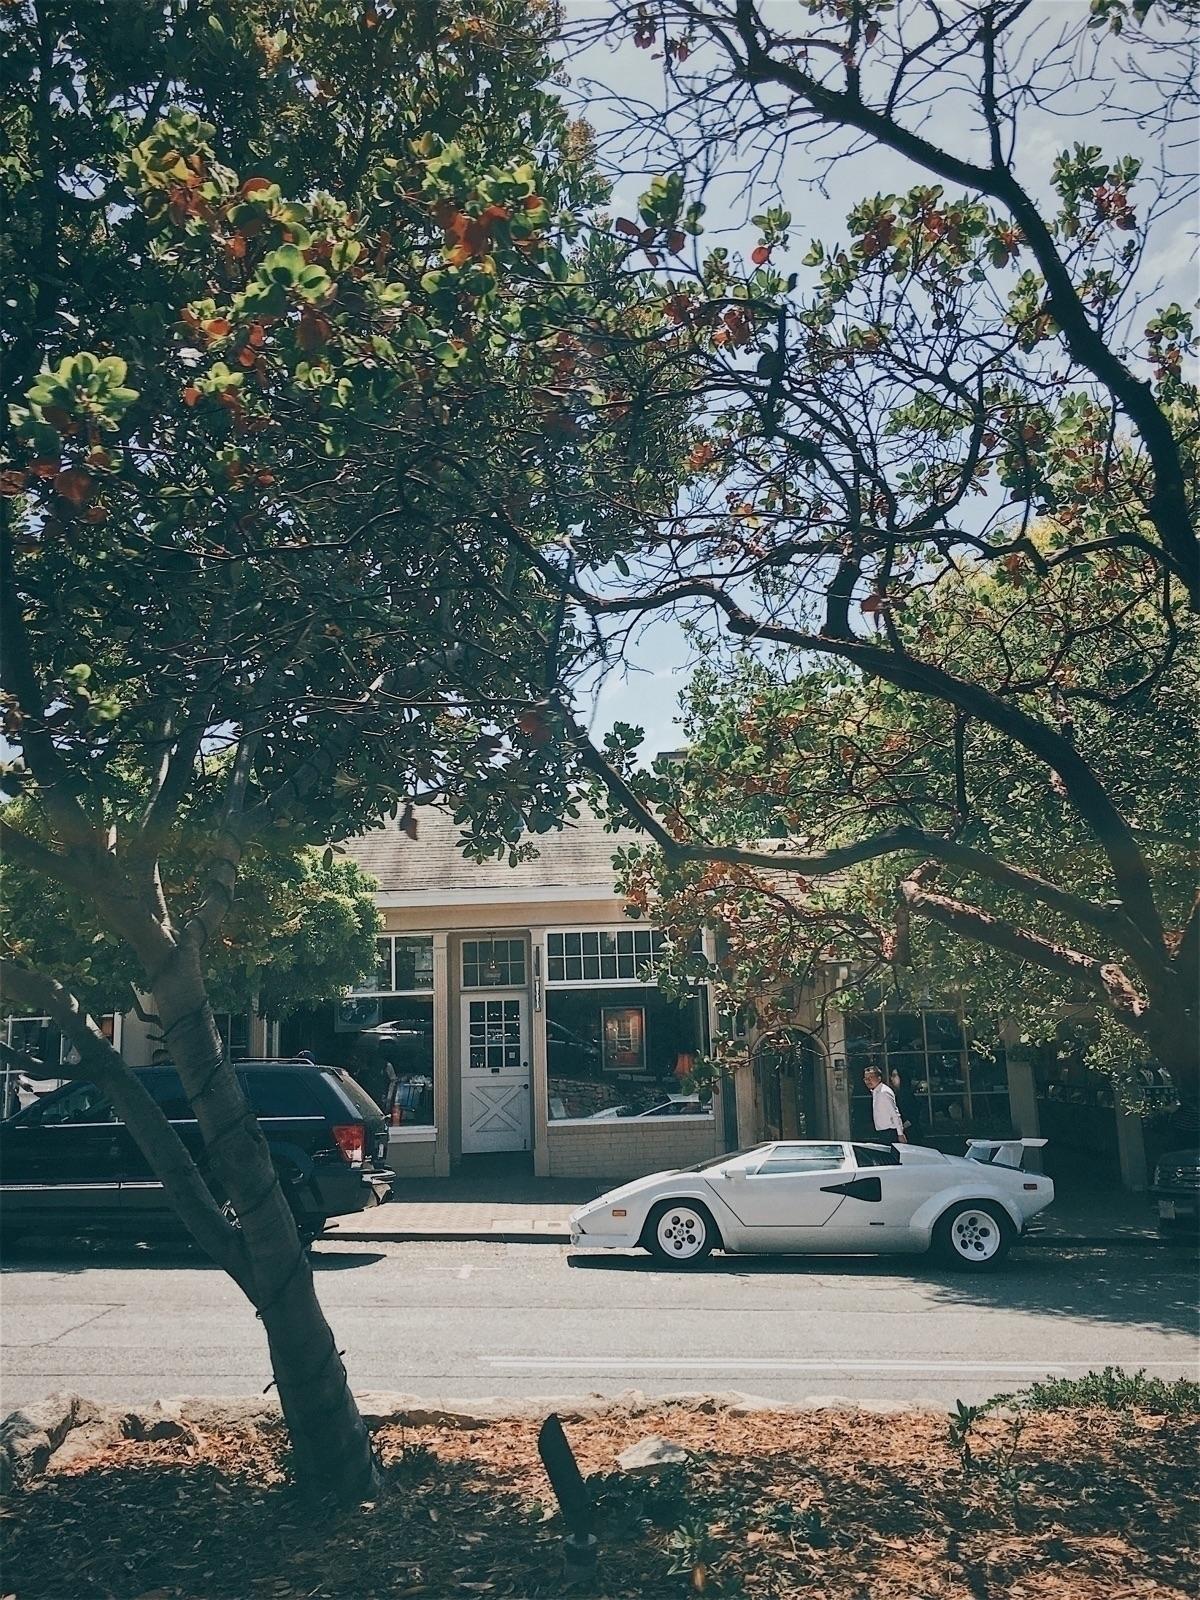 week car Monterey Bay - lamborghini - tramod | ello